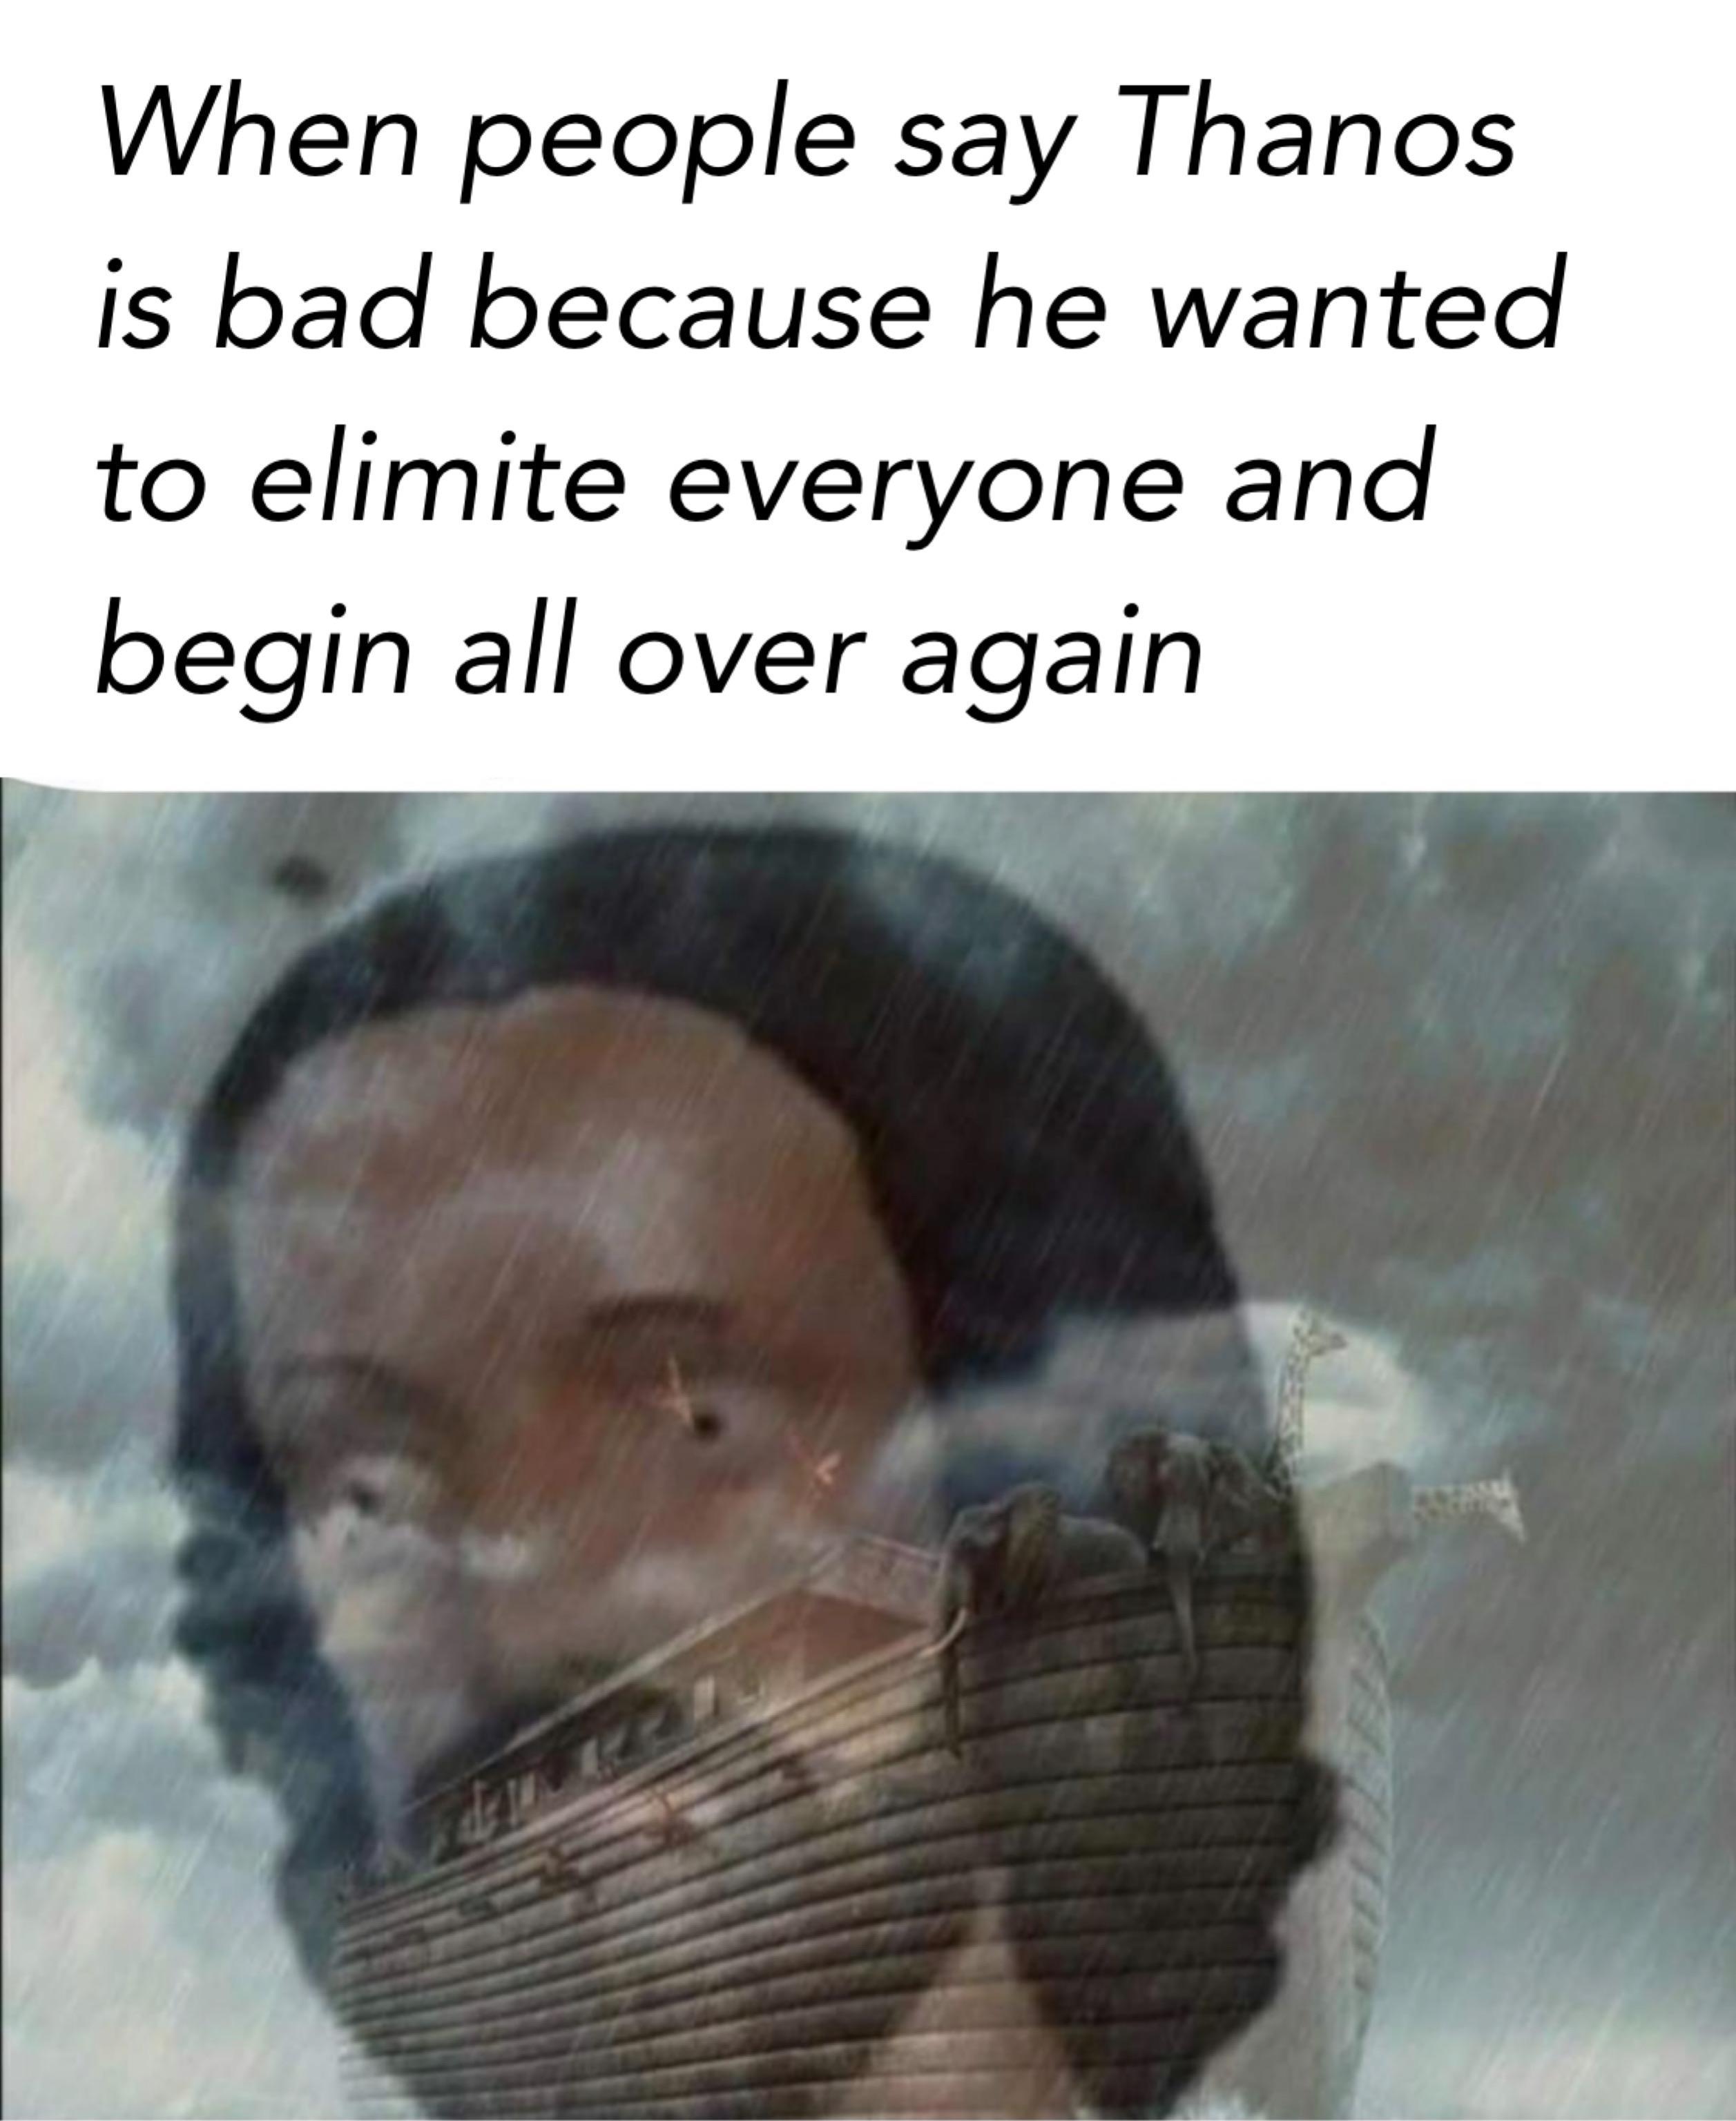 He's not bad, guys